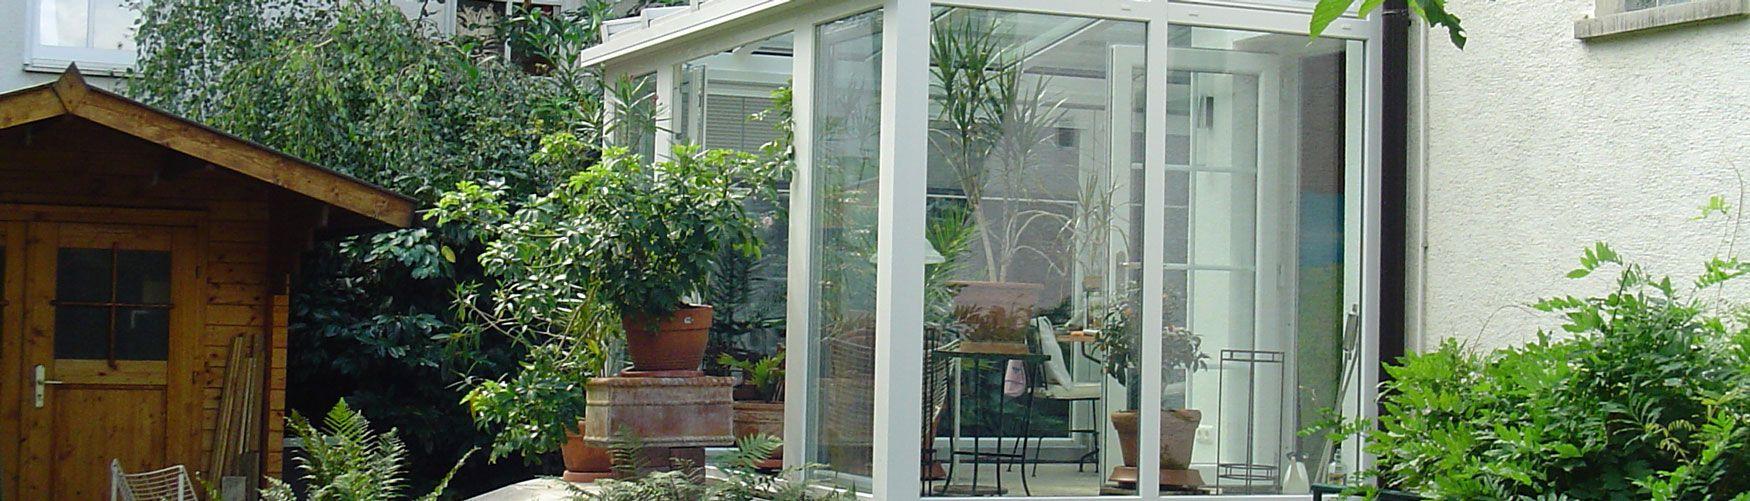 wintergarten bechtold fenster gmbh co kg. Black Bedroom Furniture Sets. Home Design Ideas